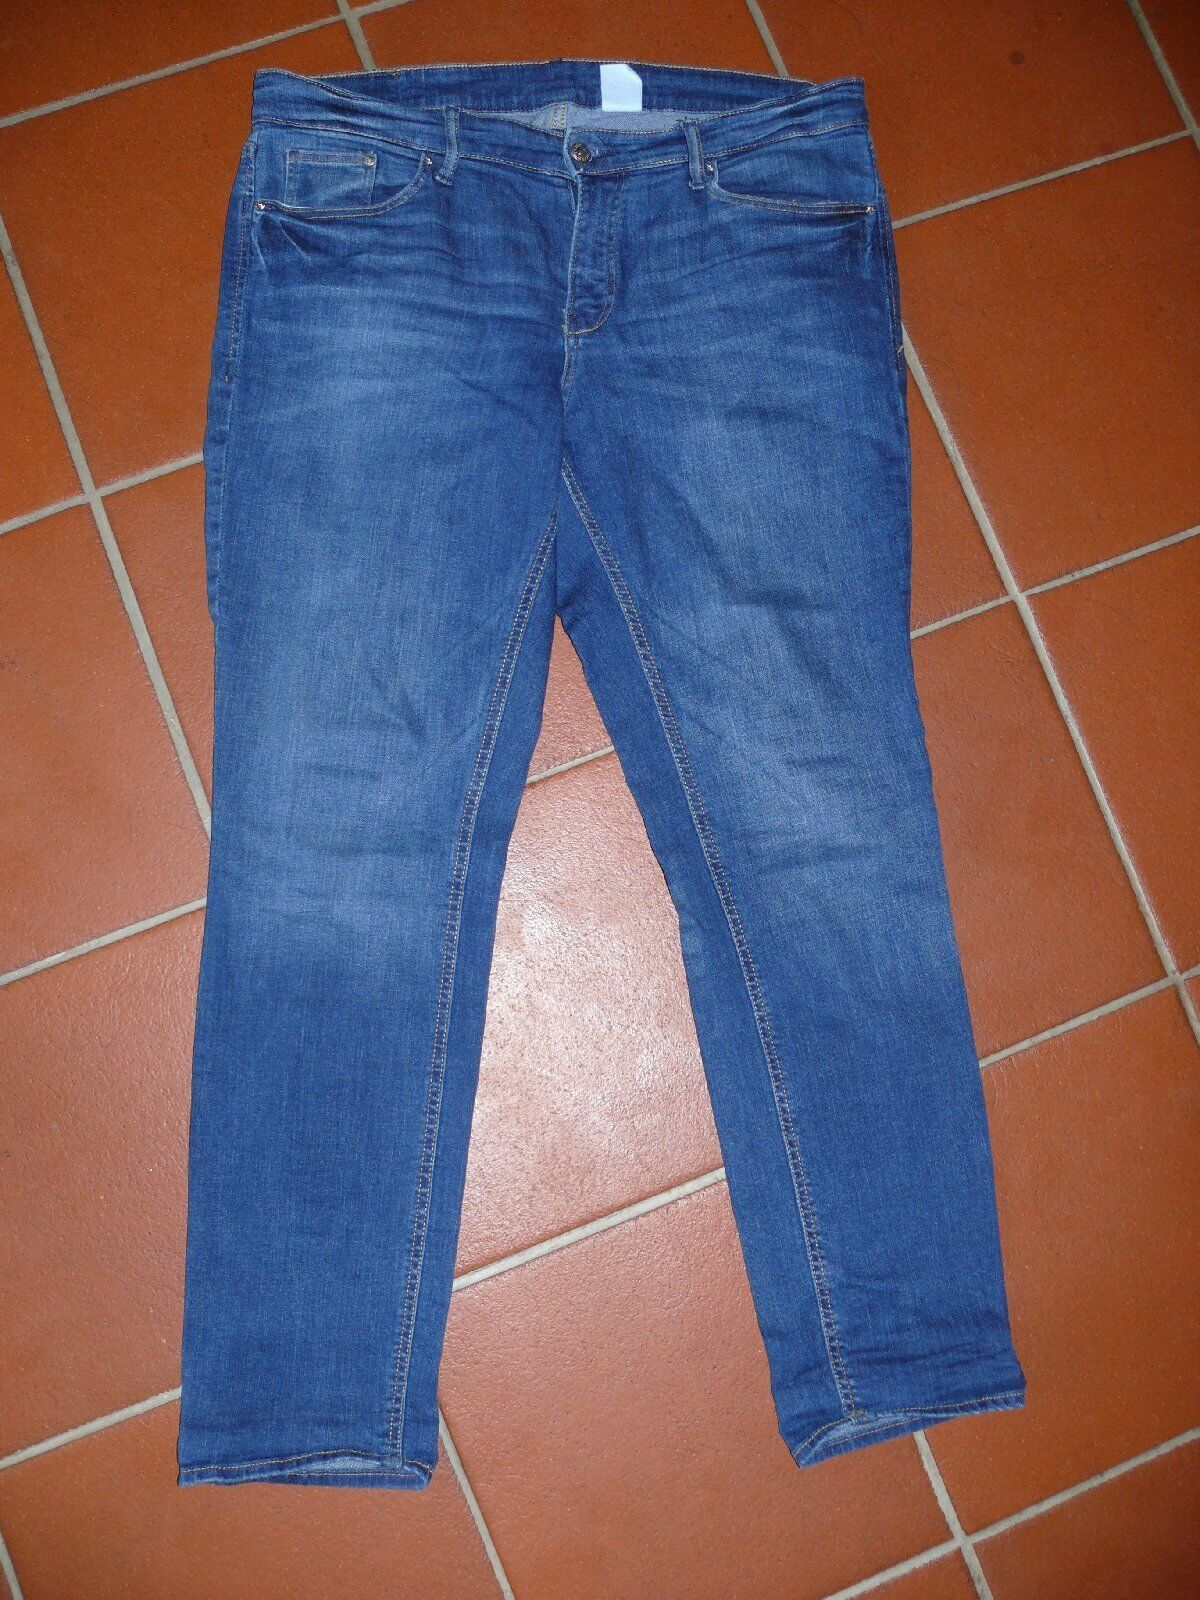 H&M Jeans Jeans Jeans Denim Dritto Girovita Regolare Tgl 48 Blu Medio 3d1f34